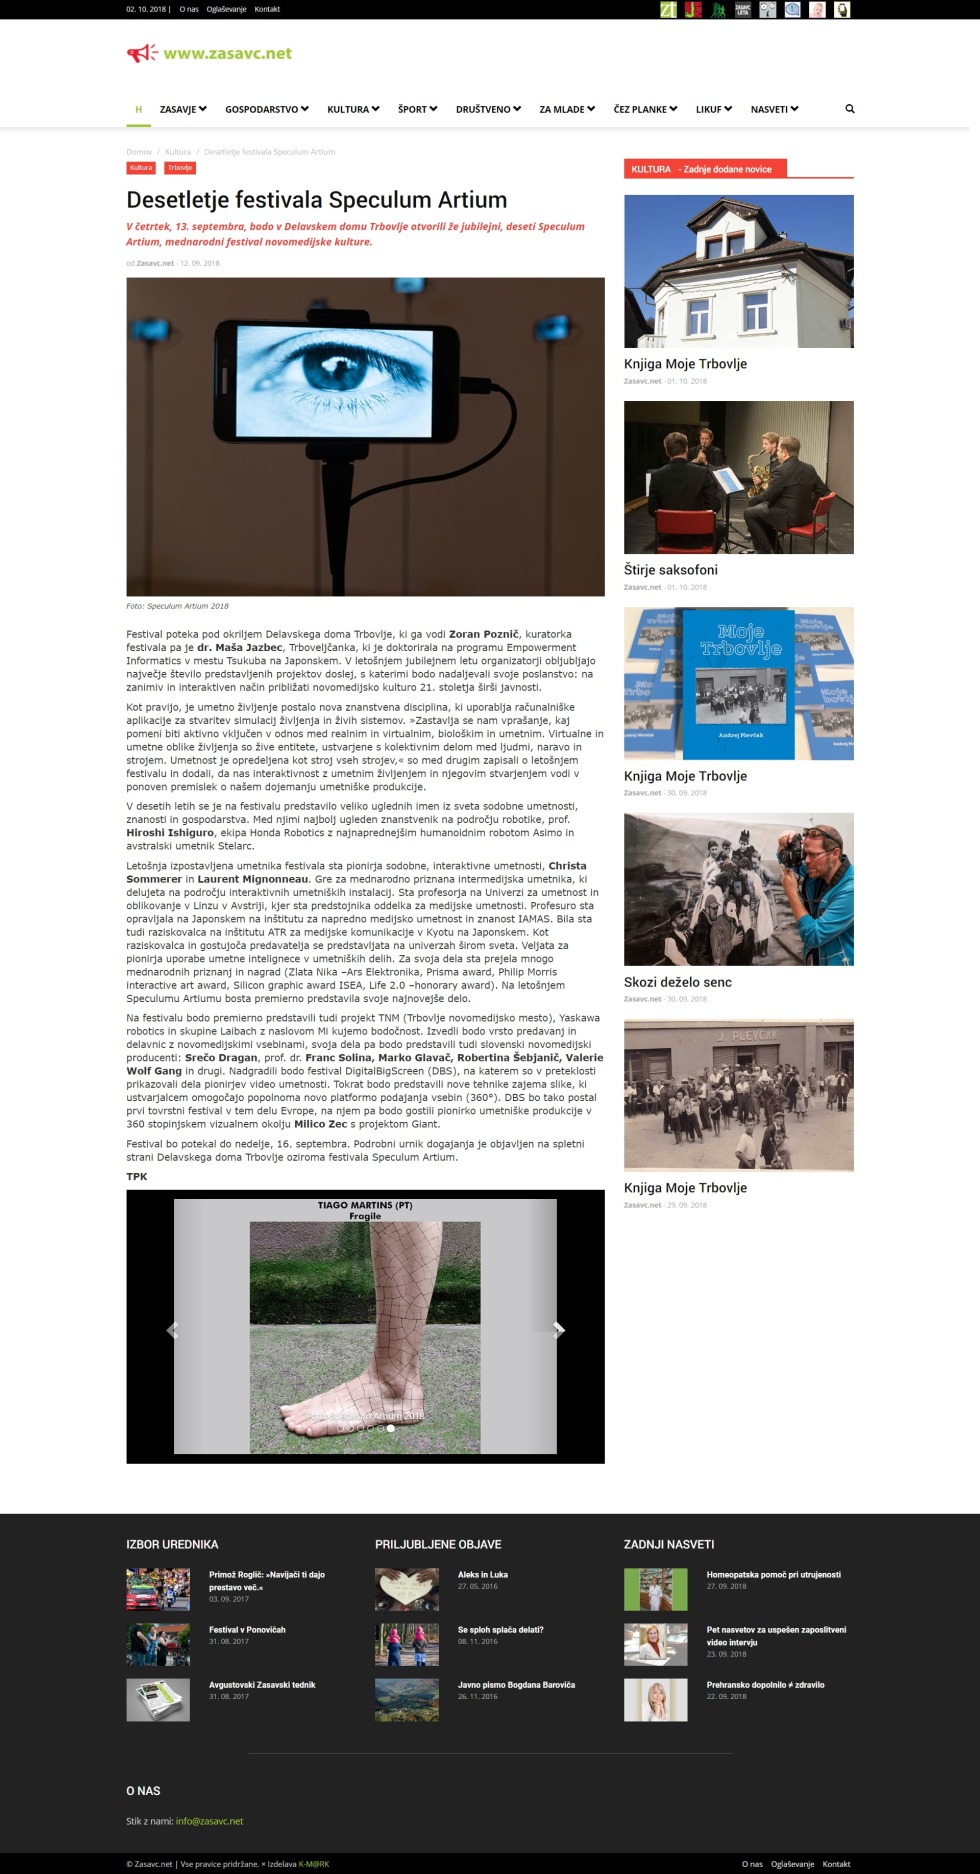 screencapture-zasavc-net-novica-desetletje-festivala-speculum-artium-1096163-2018-10-02-14_06_31.jpg